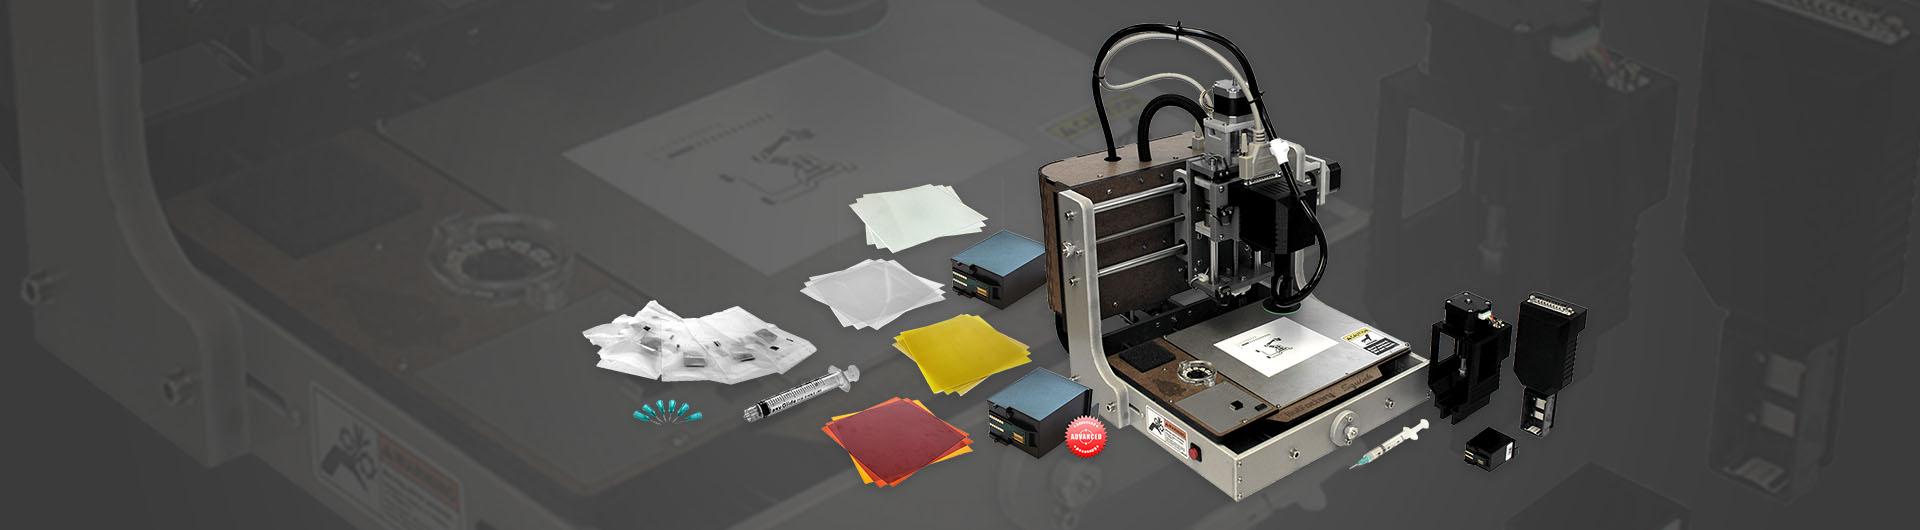 Fortex Engineering Ltd | Printed Circuit Boards, Chemical